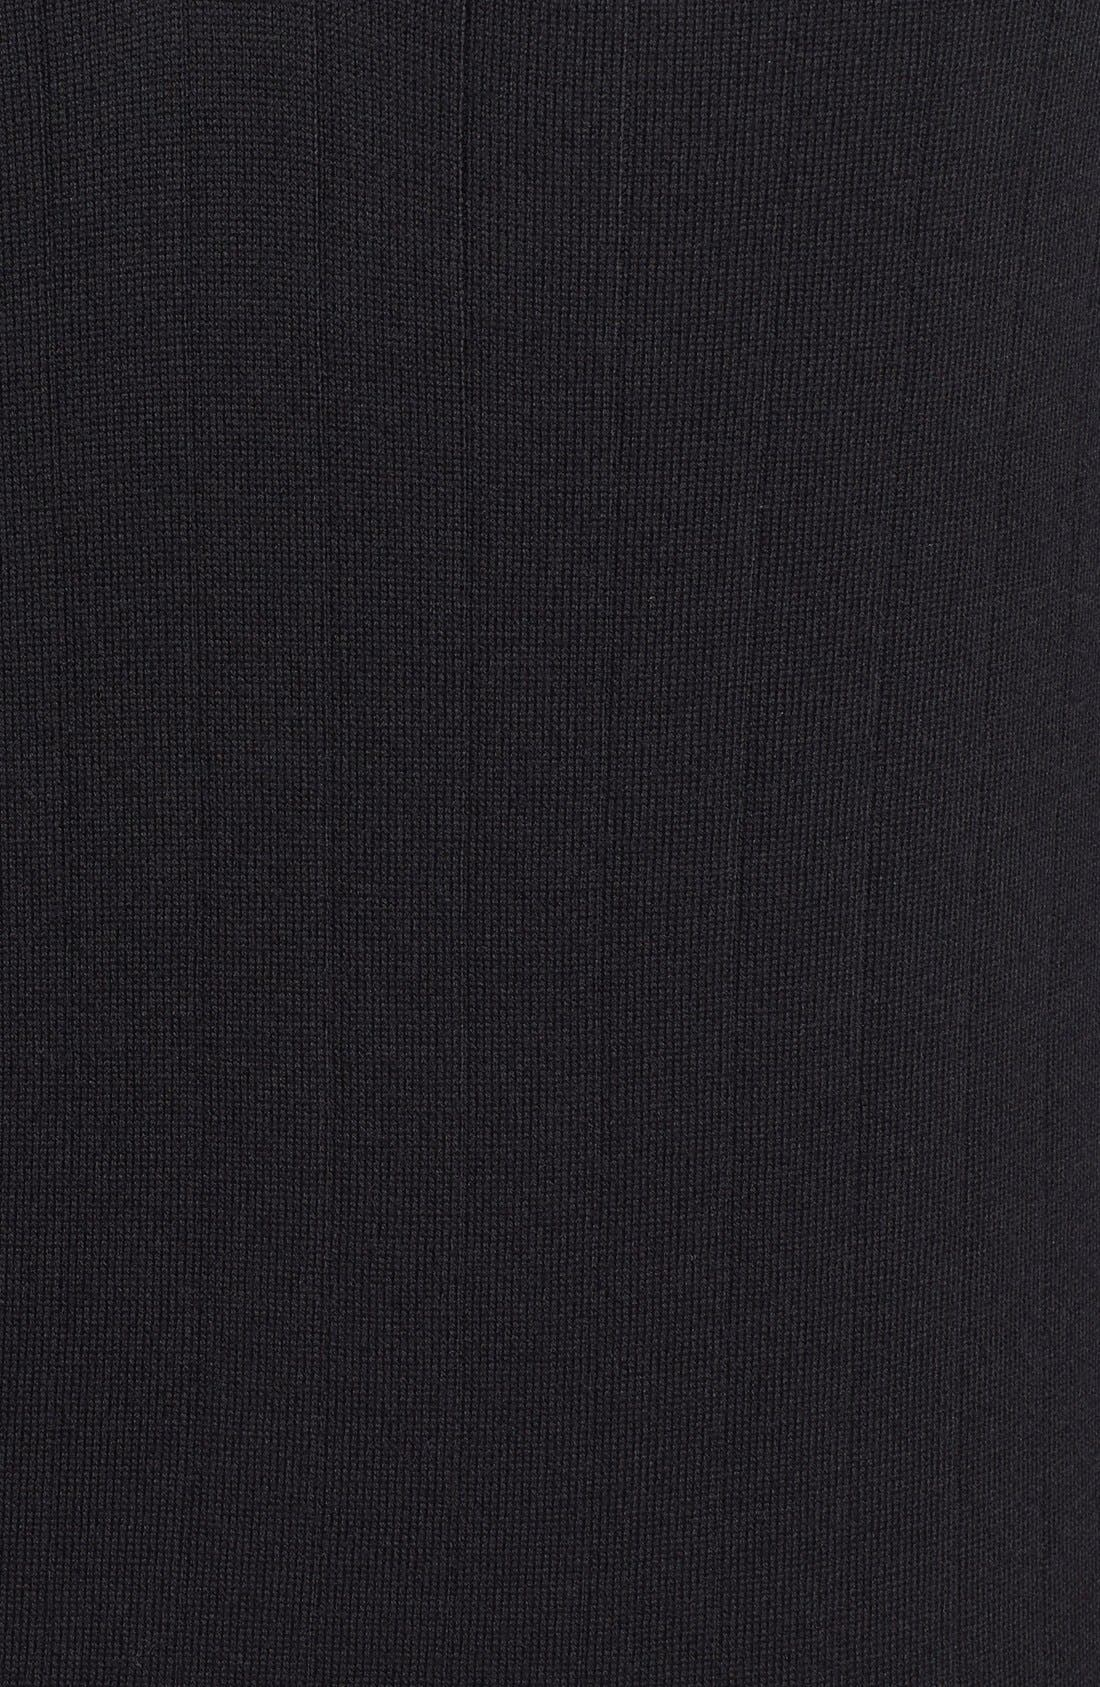 Quarter Zip Wool Sweater Vest,                             Alternate thumbnail 5, color,                             001